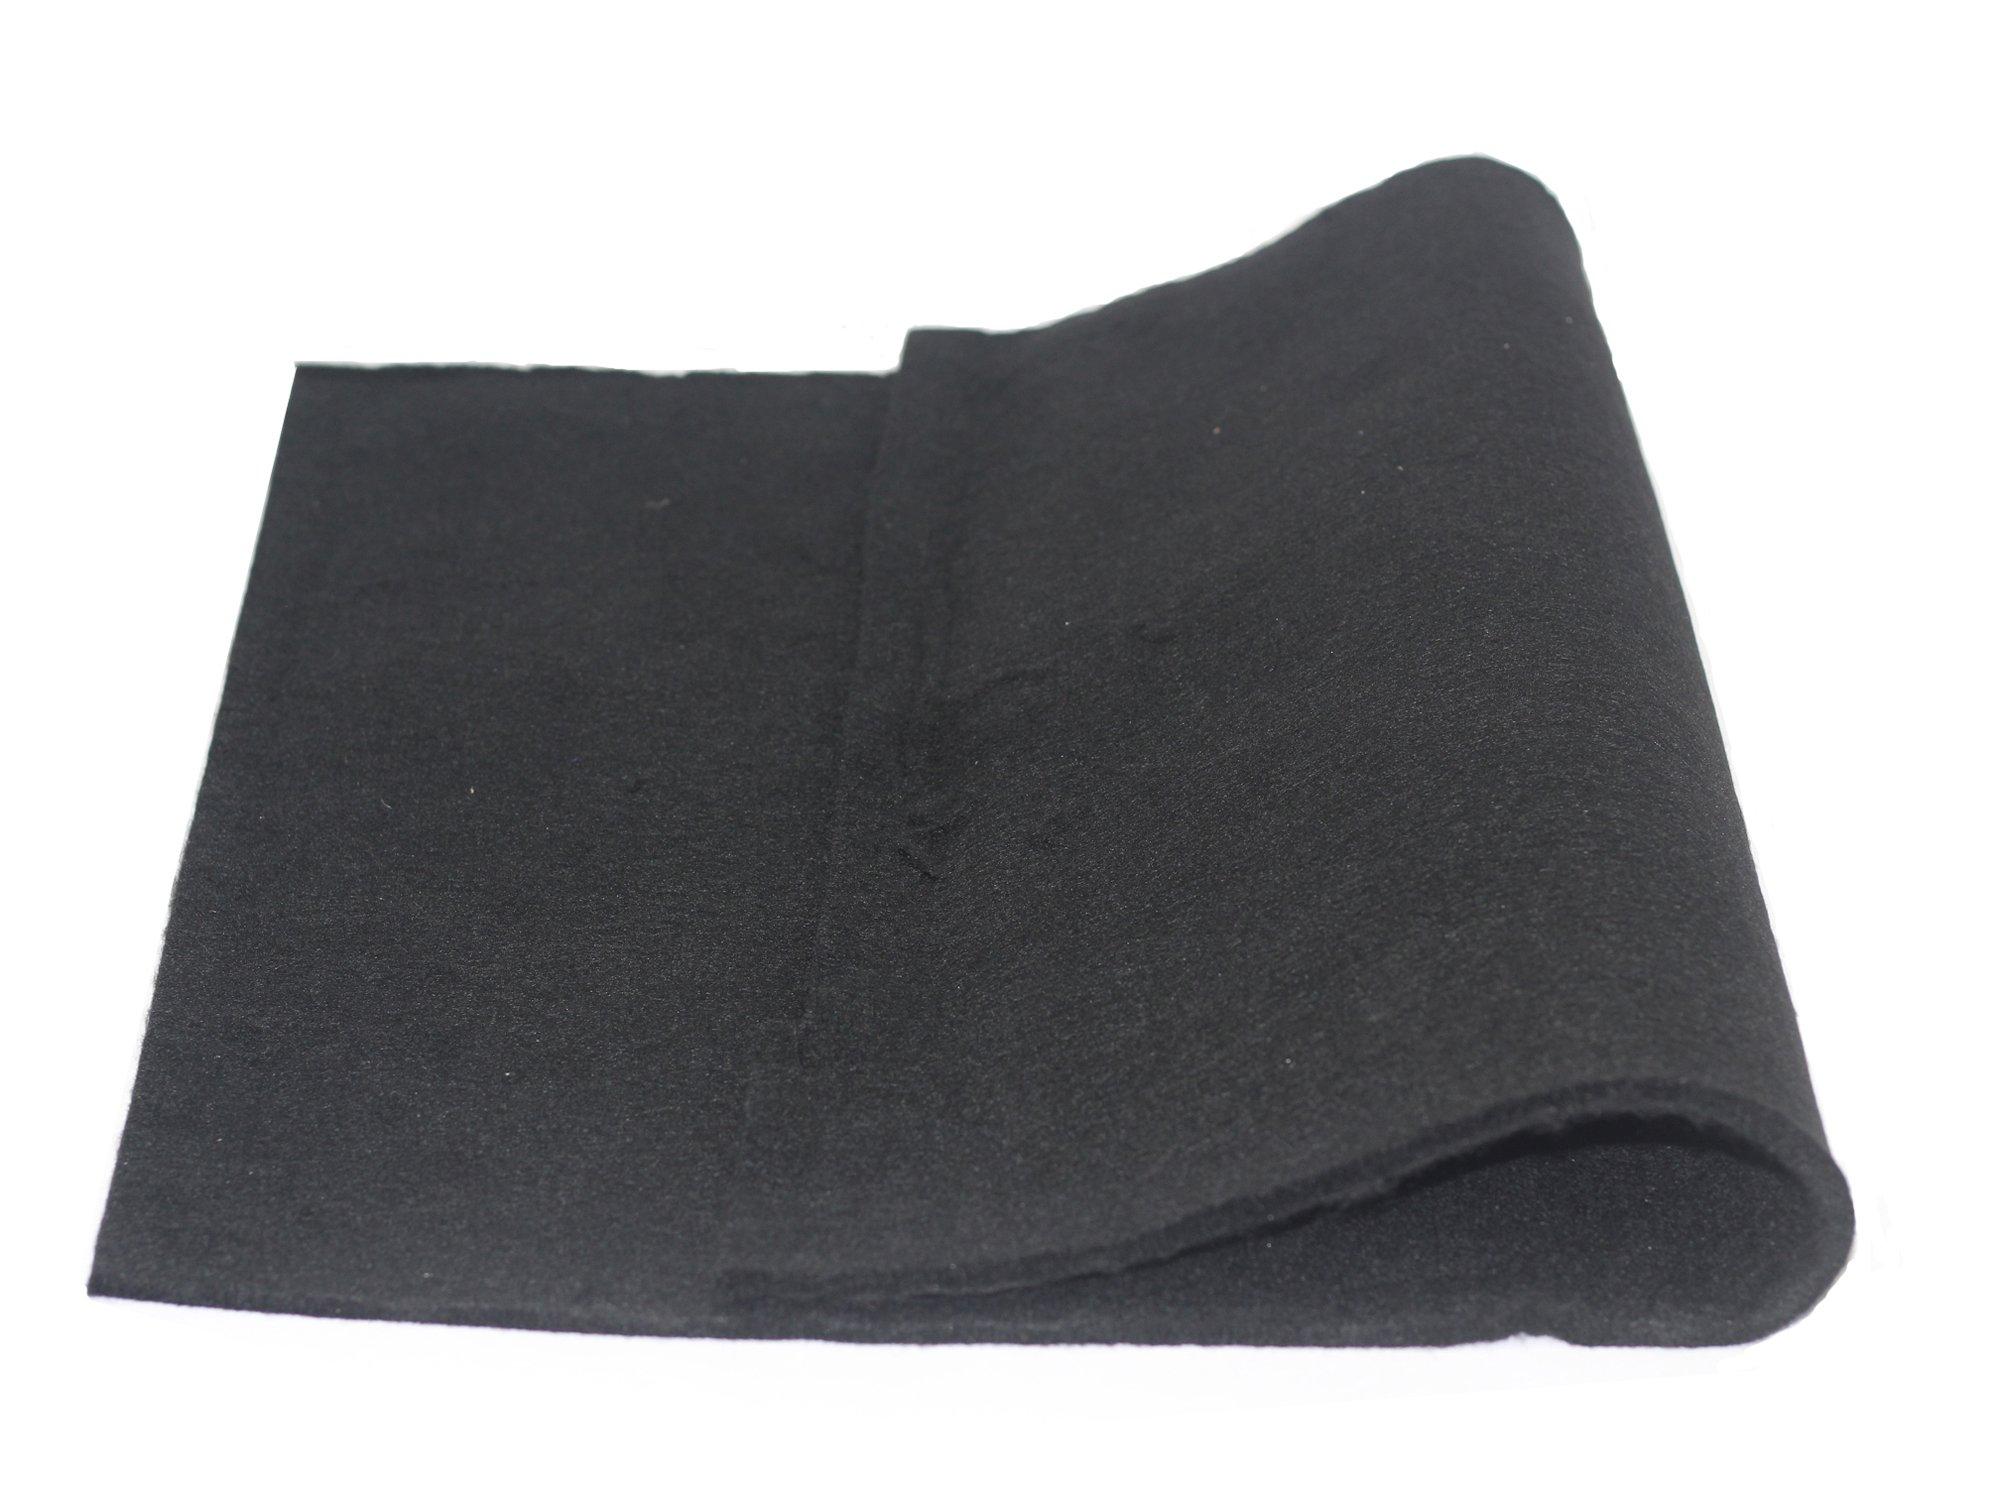 HiwowSport 18 x 24 inches High Temp Carbon Fiber Welding Protective Blanket, Heat Shield Plumbing Heat Sink Slag Fire Auto